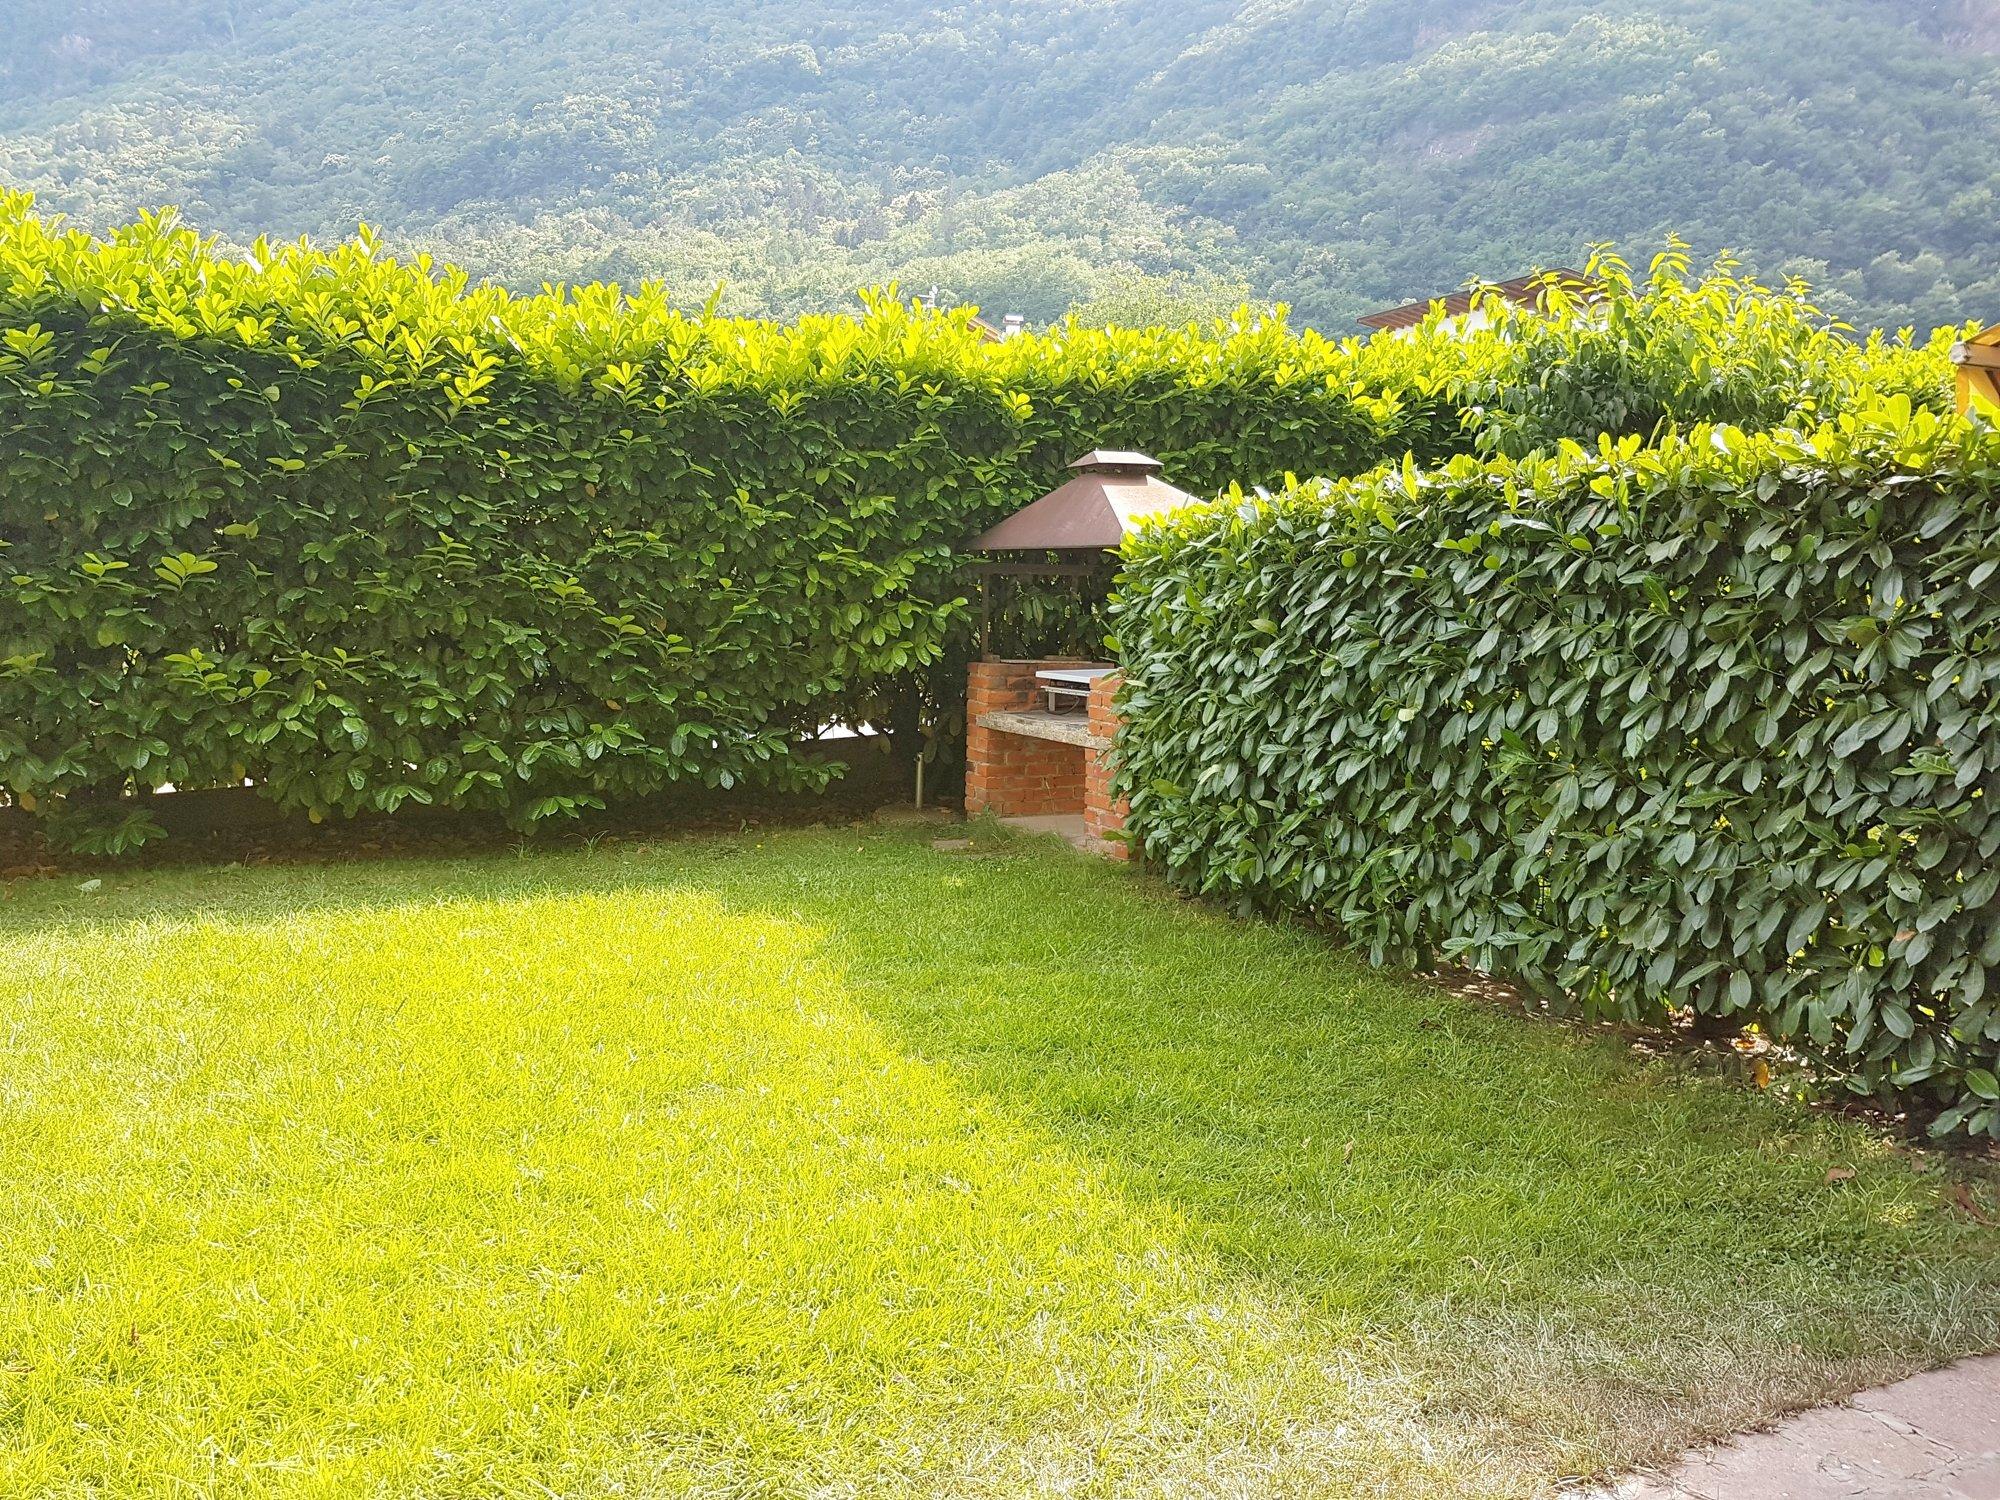 Garten mit Grillecke_giardino con barbecue